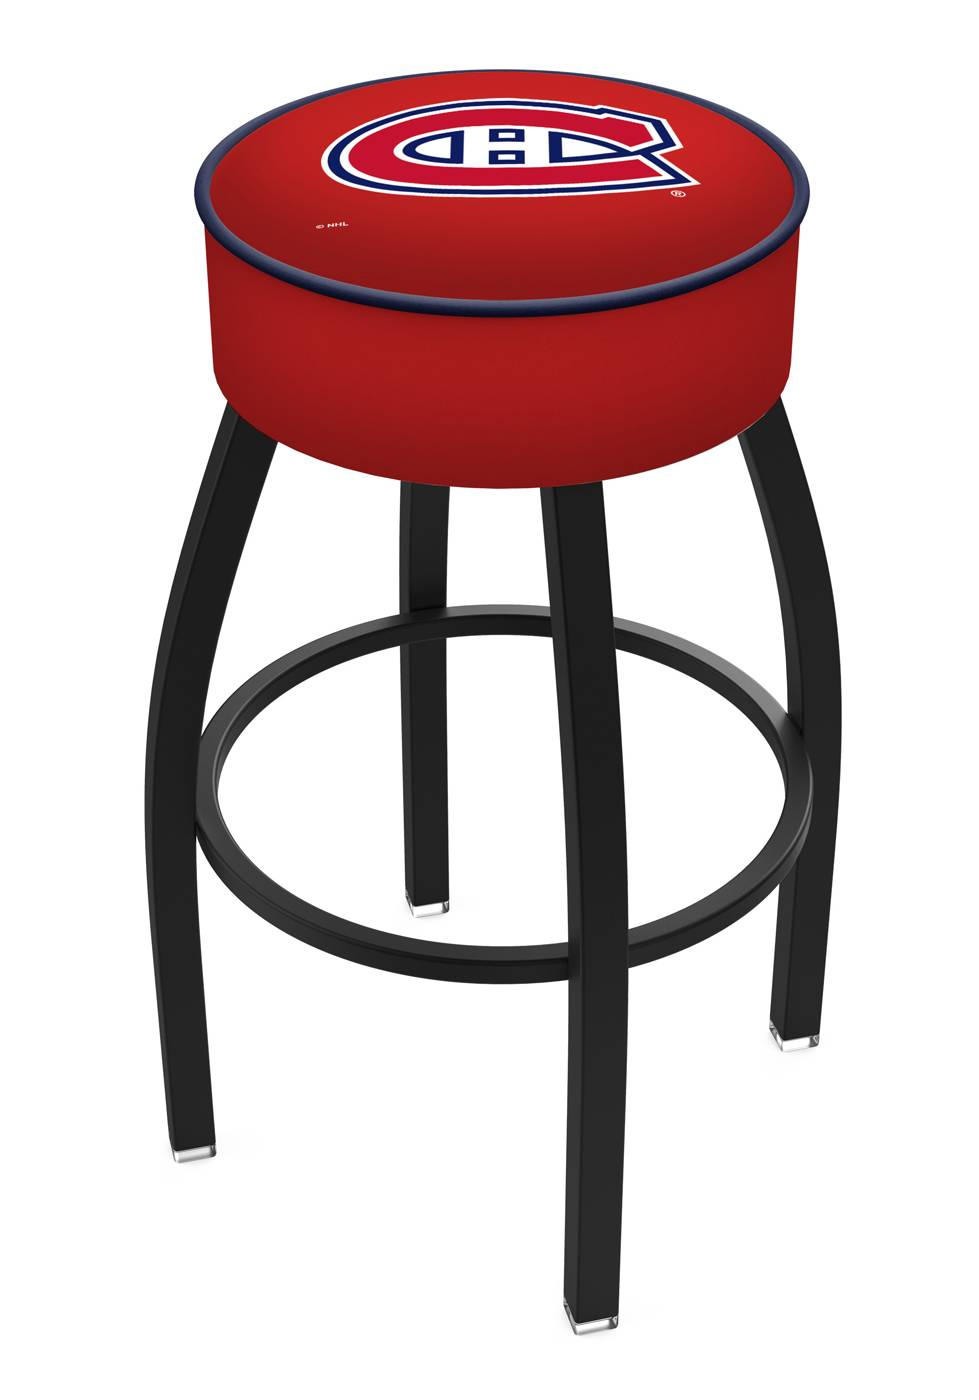 Home bar stool boston bar stool - Montreal Canadiens Black Base Swivel Bar Stool